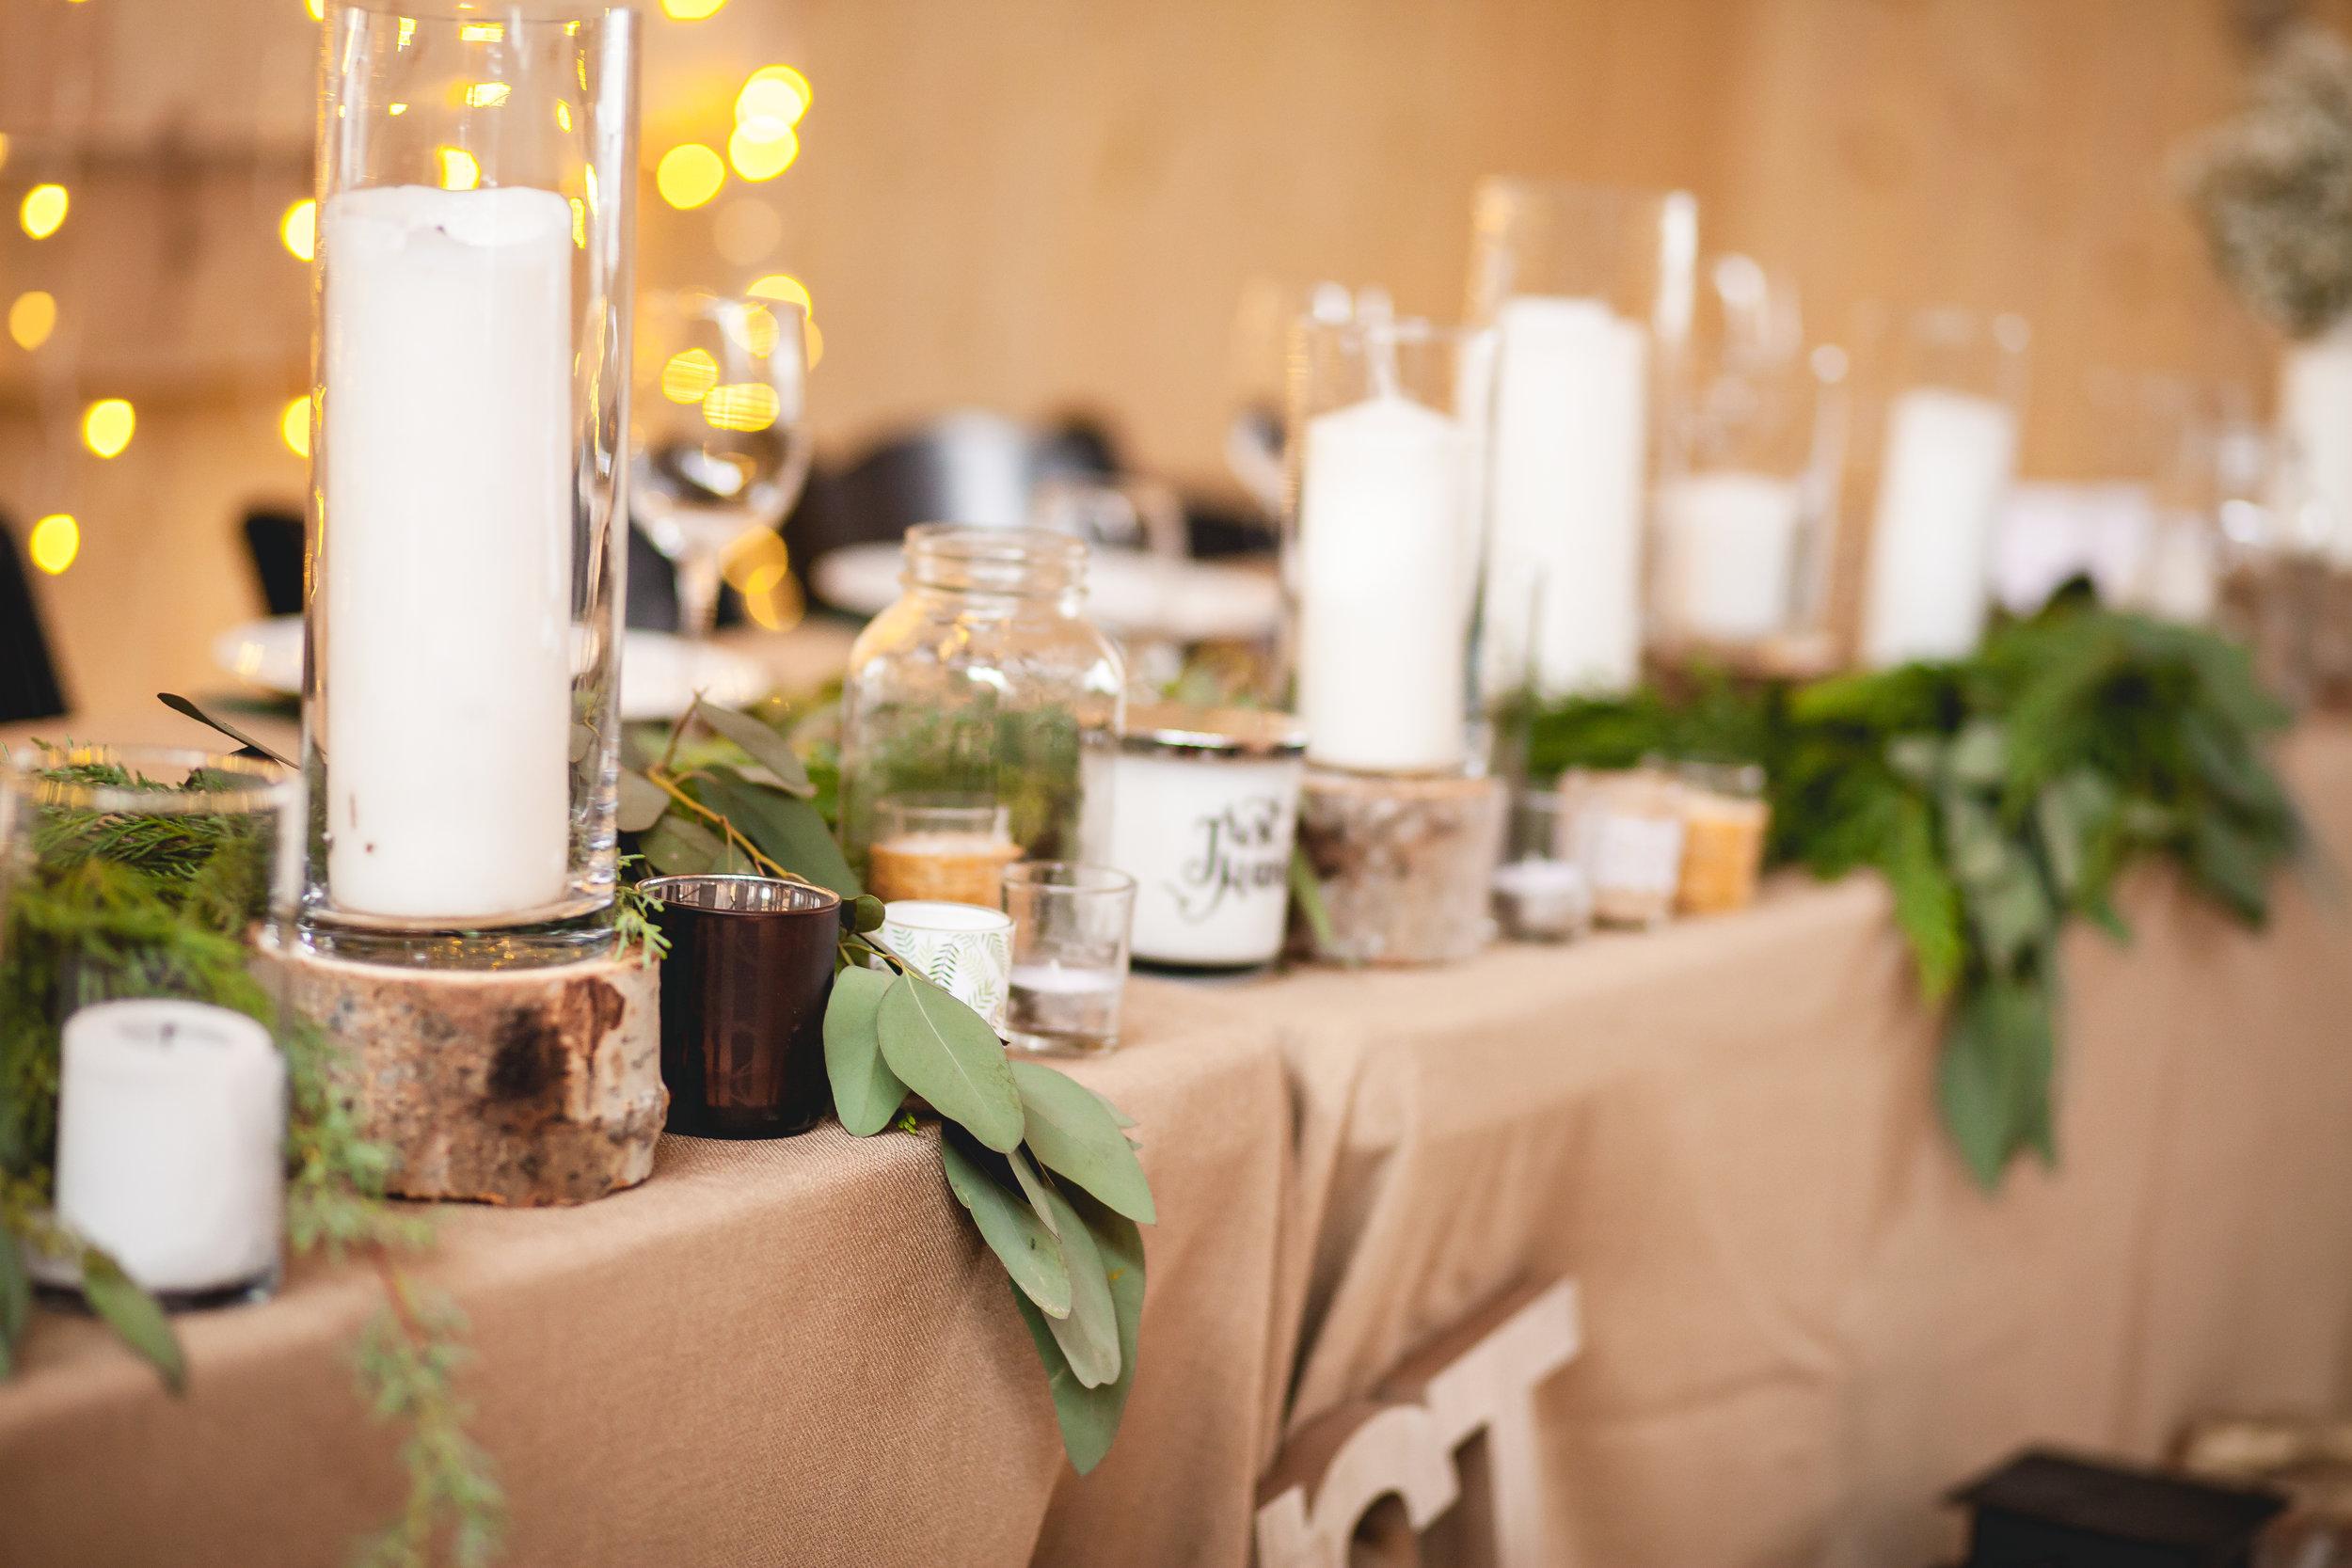 Amy D Photography- Winter Wedding- Tiffin Centre- Vintage Wedding Decor- Rustic Wedding- Wedding Decorations- Barrie Wedding Photography- Wedding Decor Ideas- Barrie Weddings (111 of 129).jpg